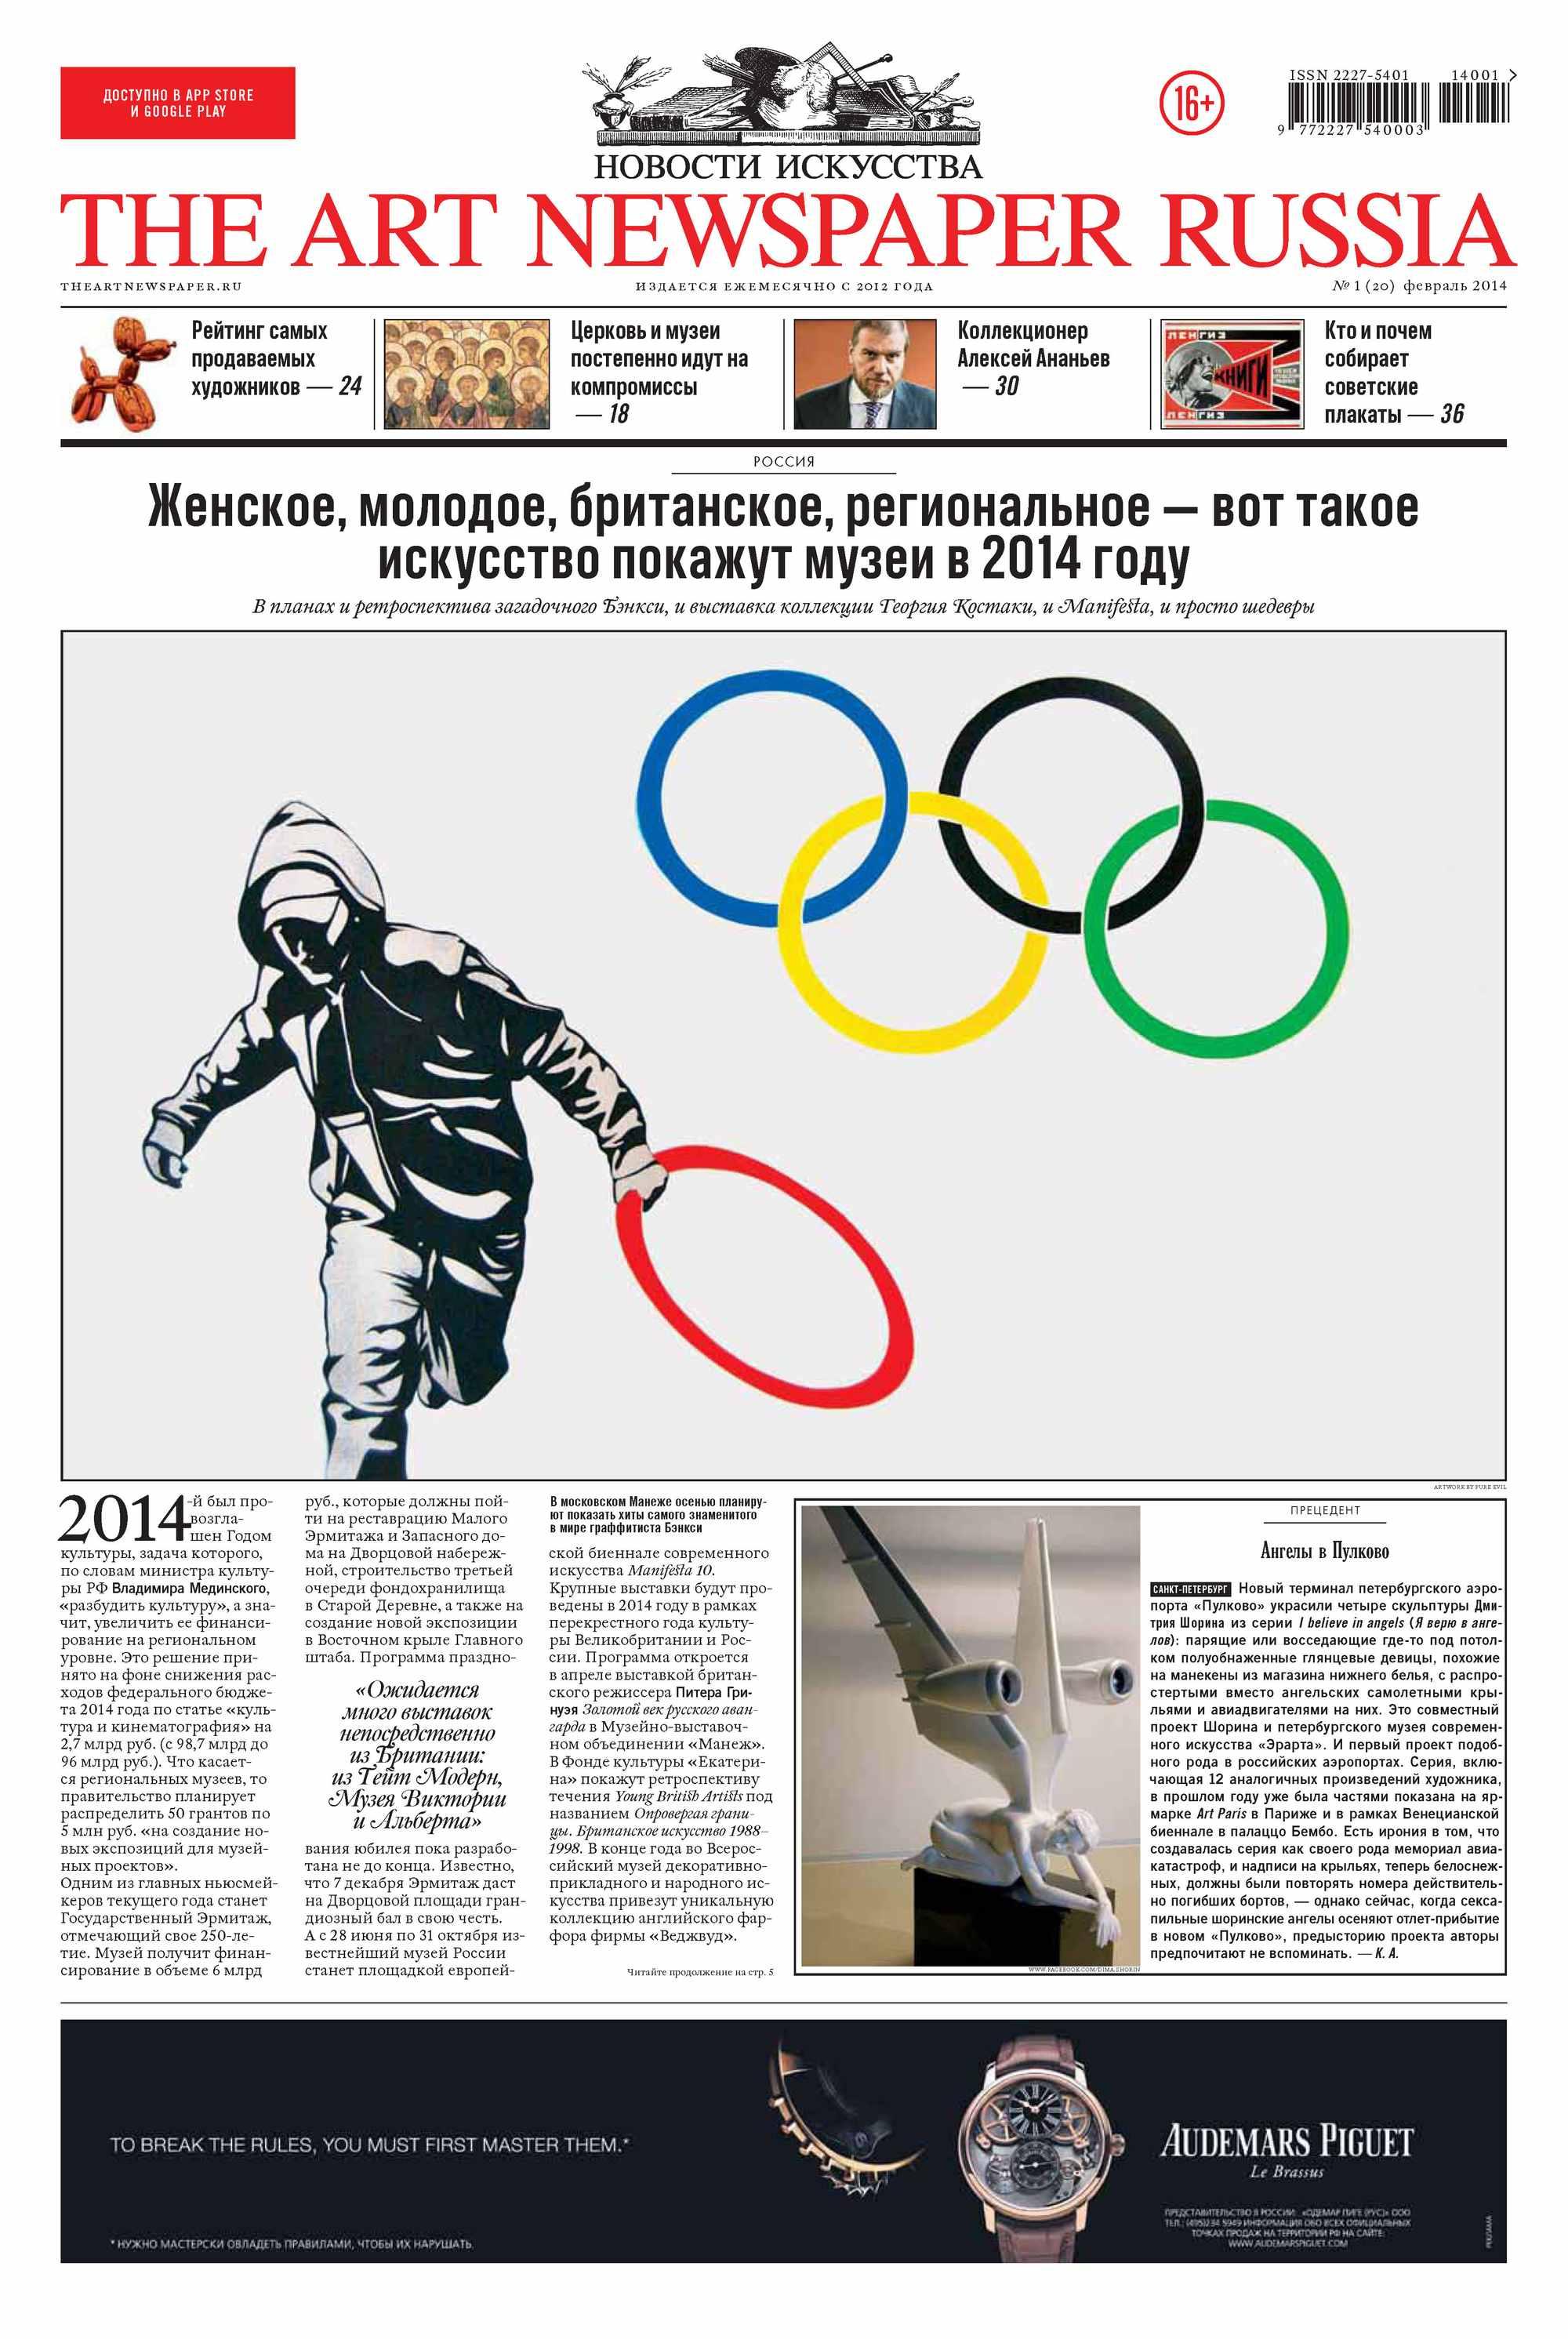 The Art Newspaper Russia №01 / февраль 2014